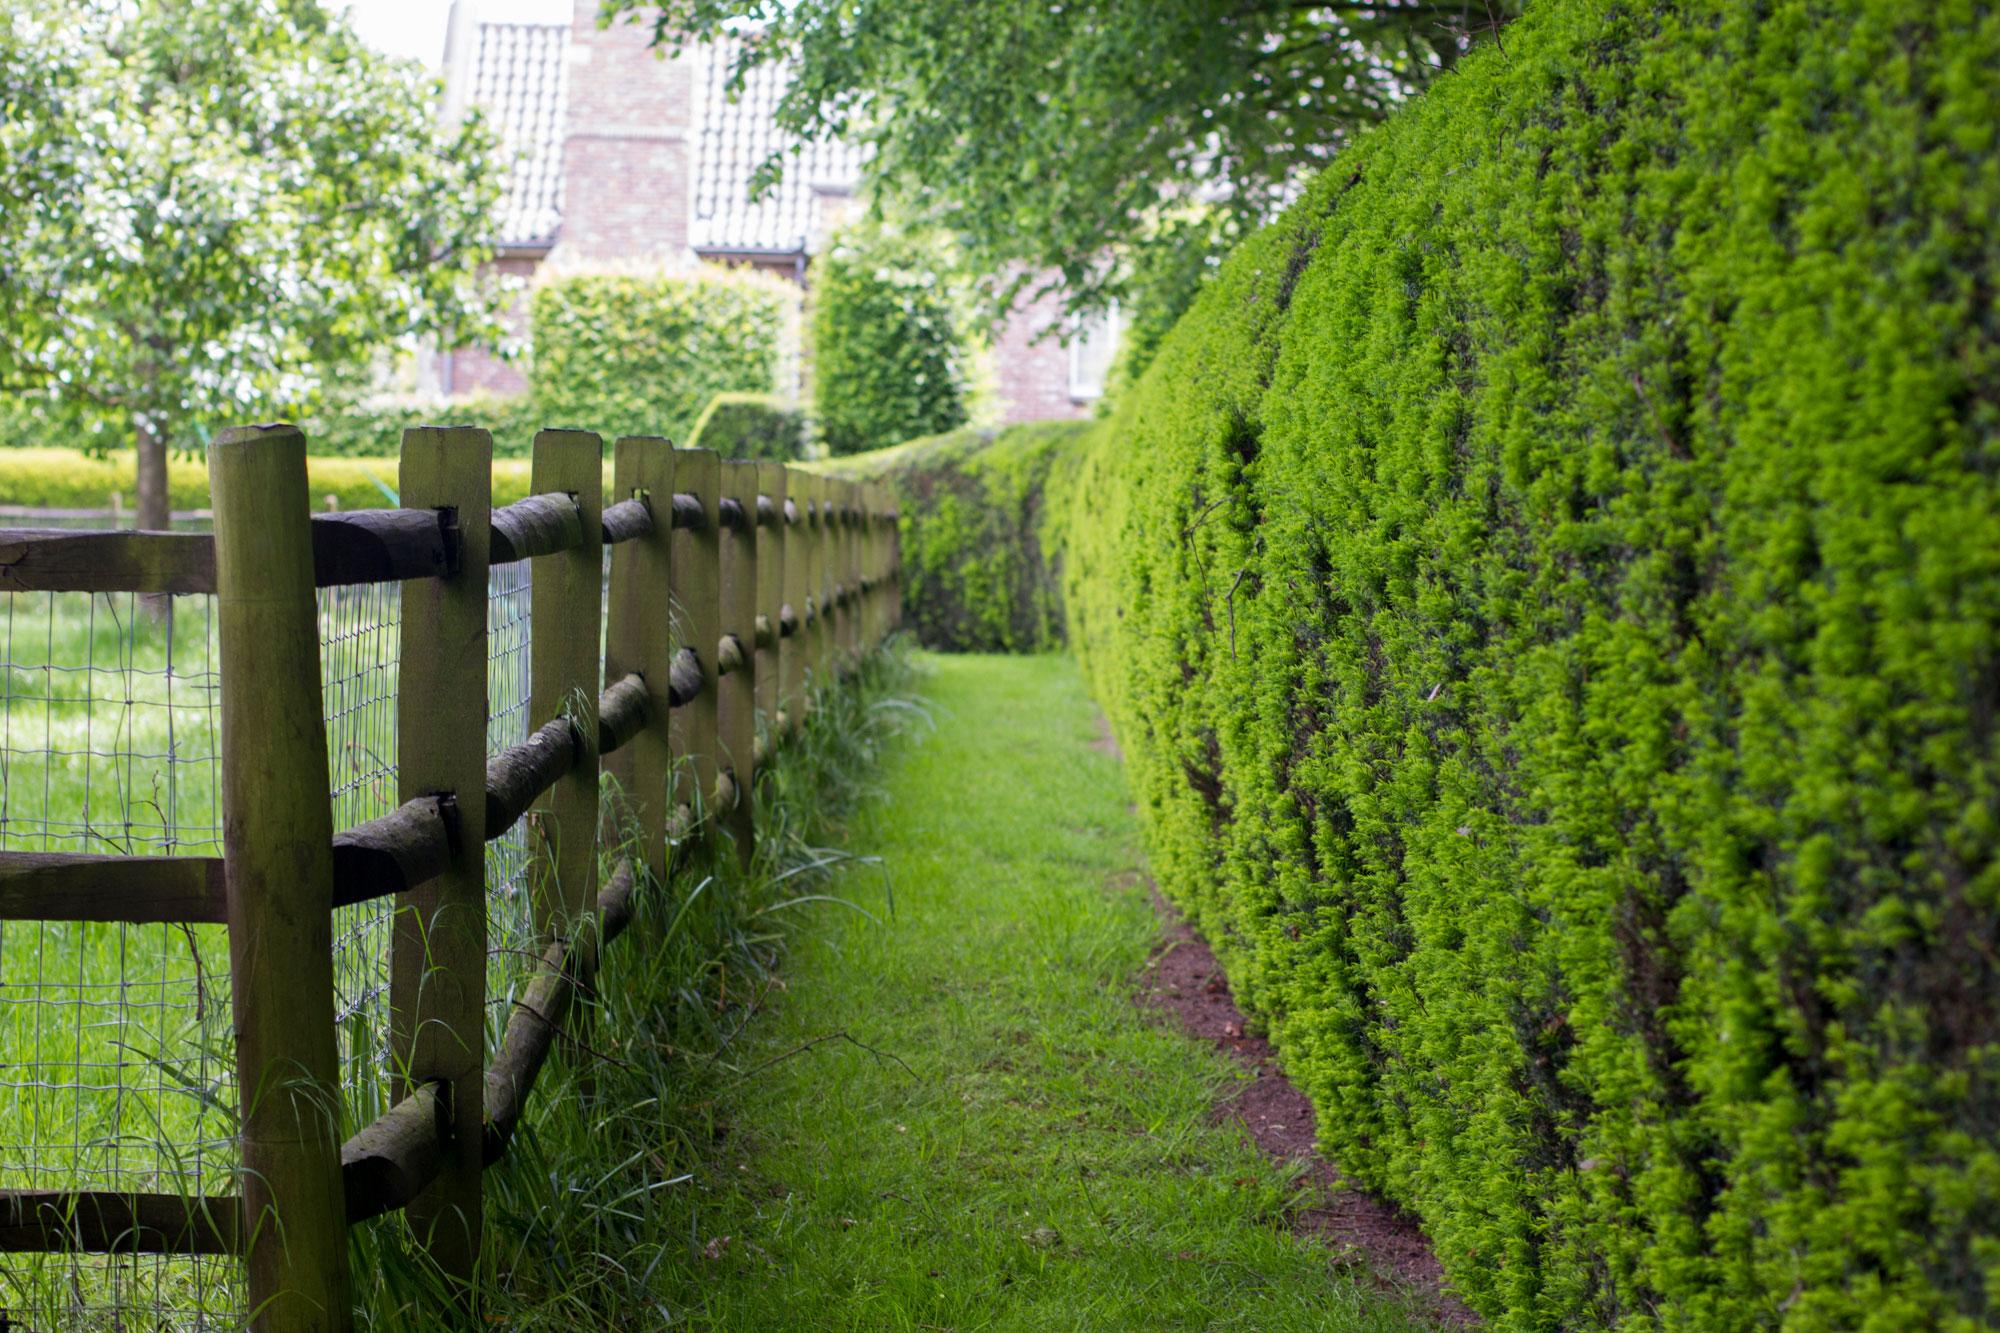 graspad tussen struik en hek